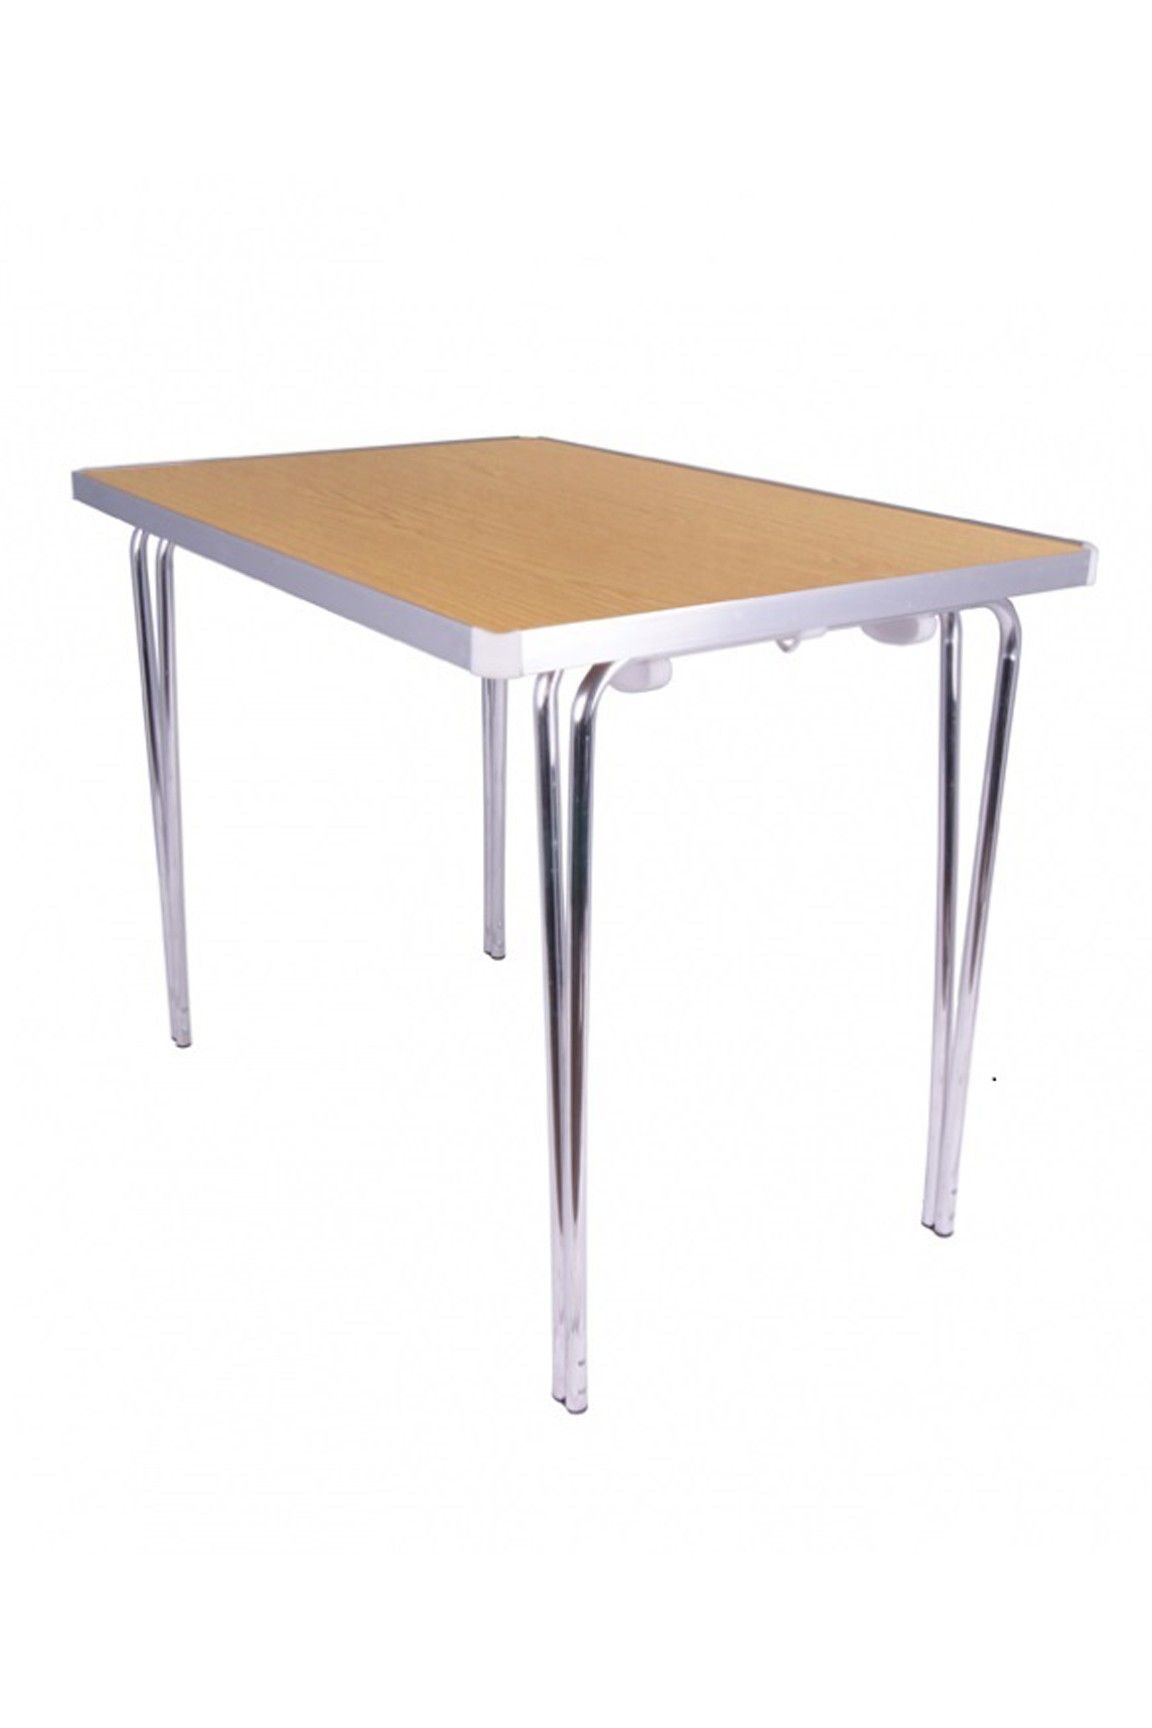 Rectangle Economy Folding Table 3ft X 2ft 92cm 60cm